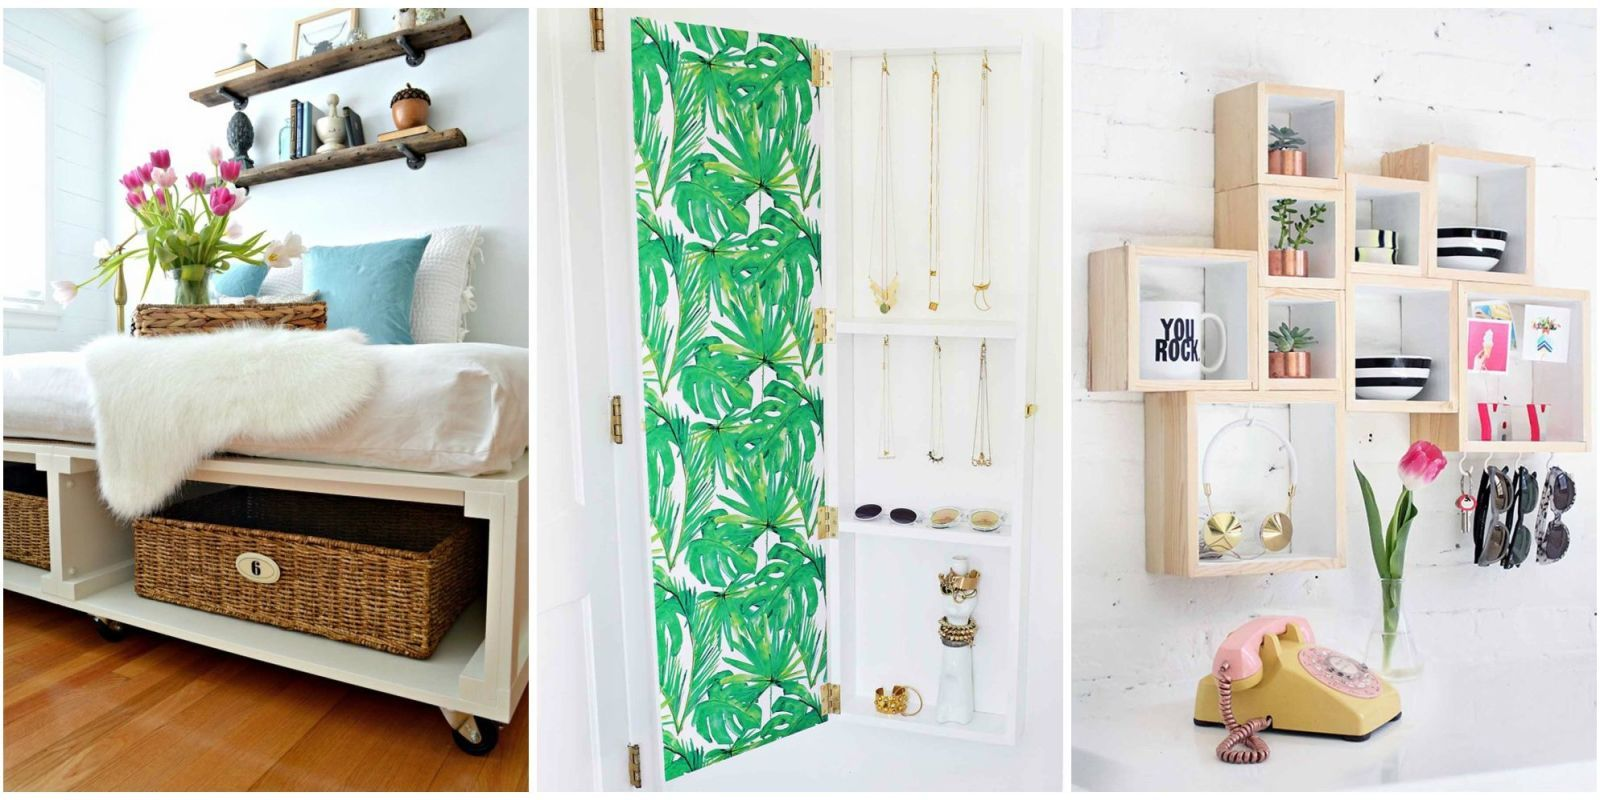 Genial Bedroom Organization Ideas